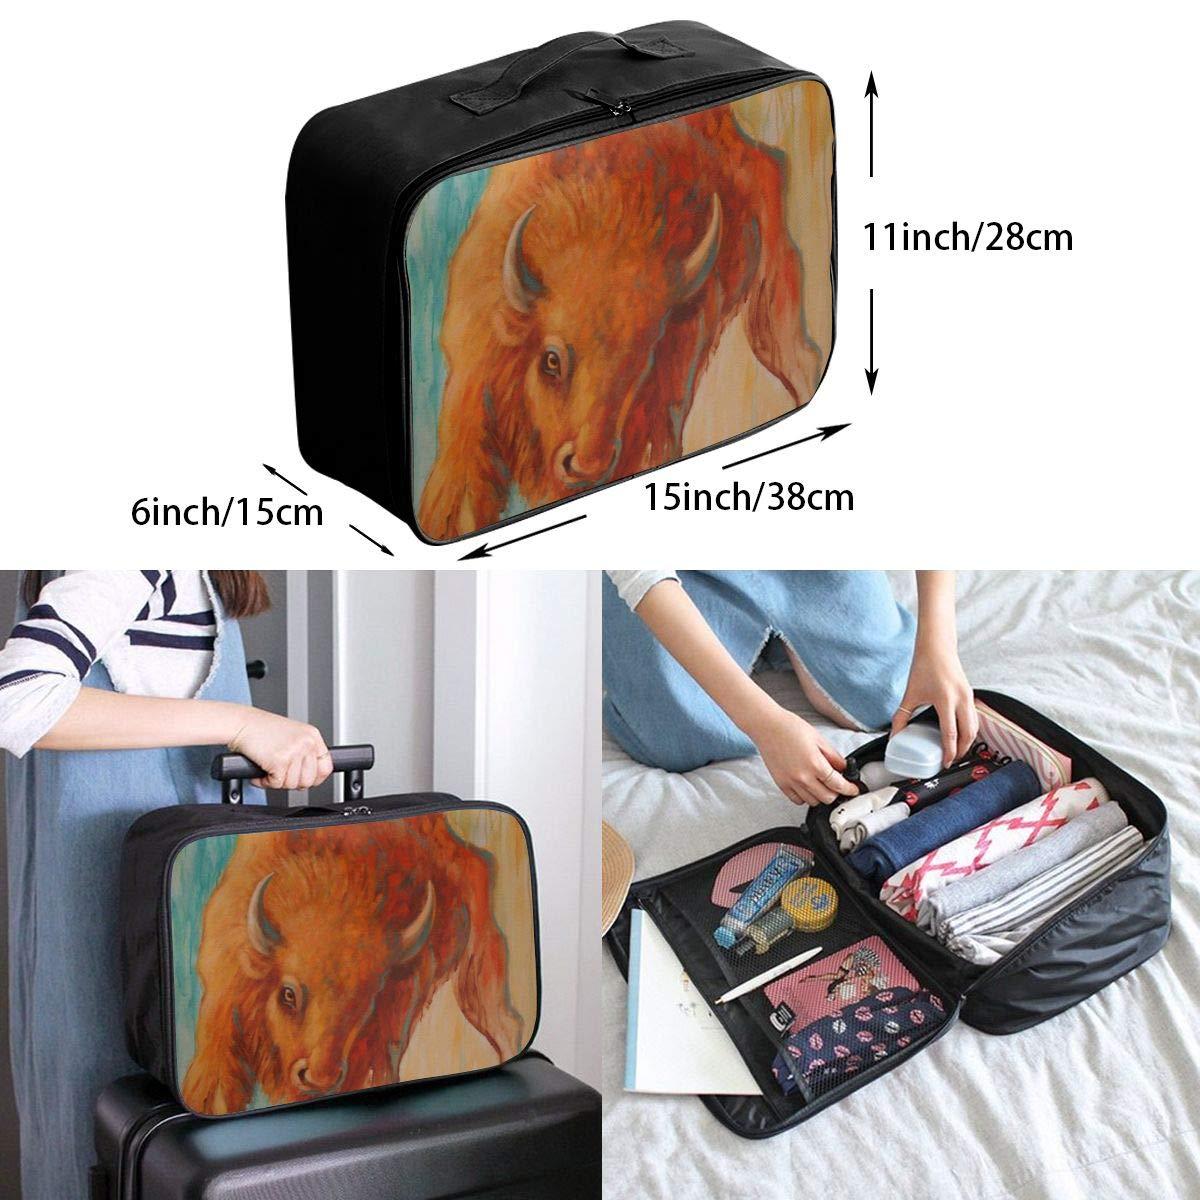 Travel Luggage Duffle Bag Lightweight Portable Handbag Bison Painting Large Capacity Waterproof Foldable Storage Tote